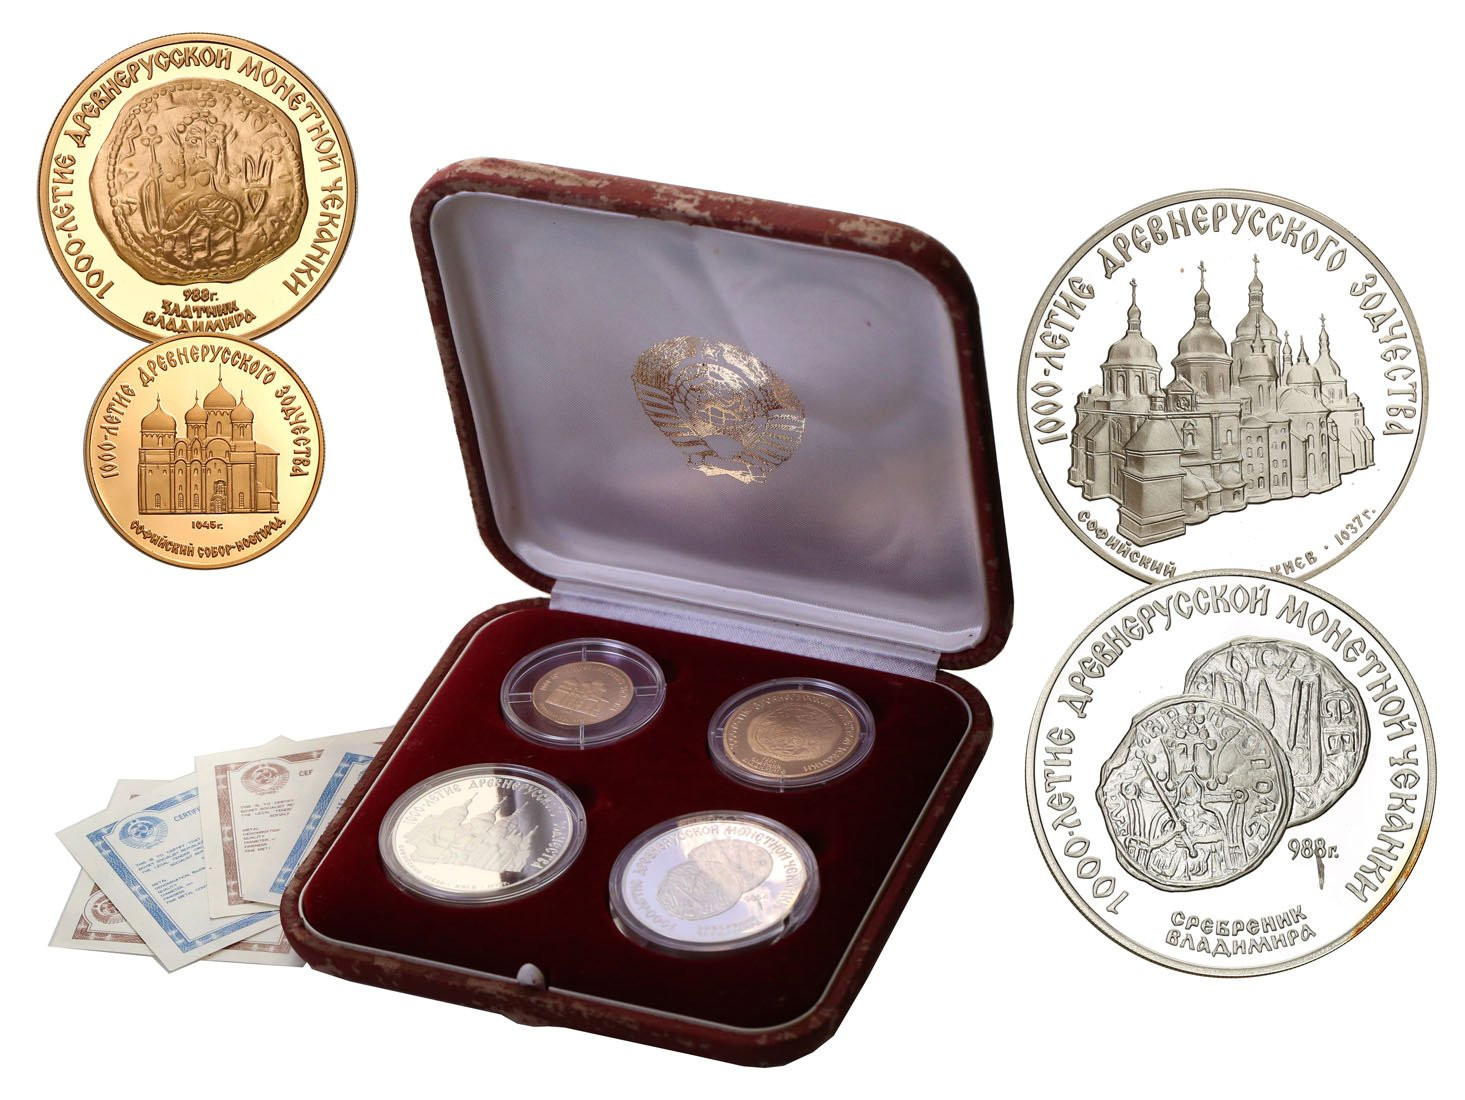 Rosja 3 Ruble + 50 Rubli + 100 Rubli 1988 - zestaw 4 monet ZŁOTO + SREBRO